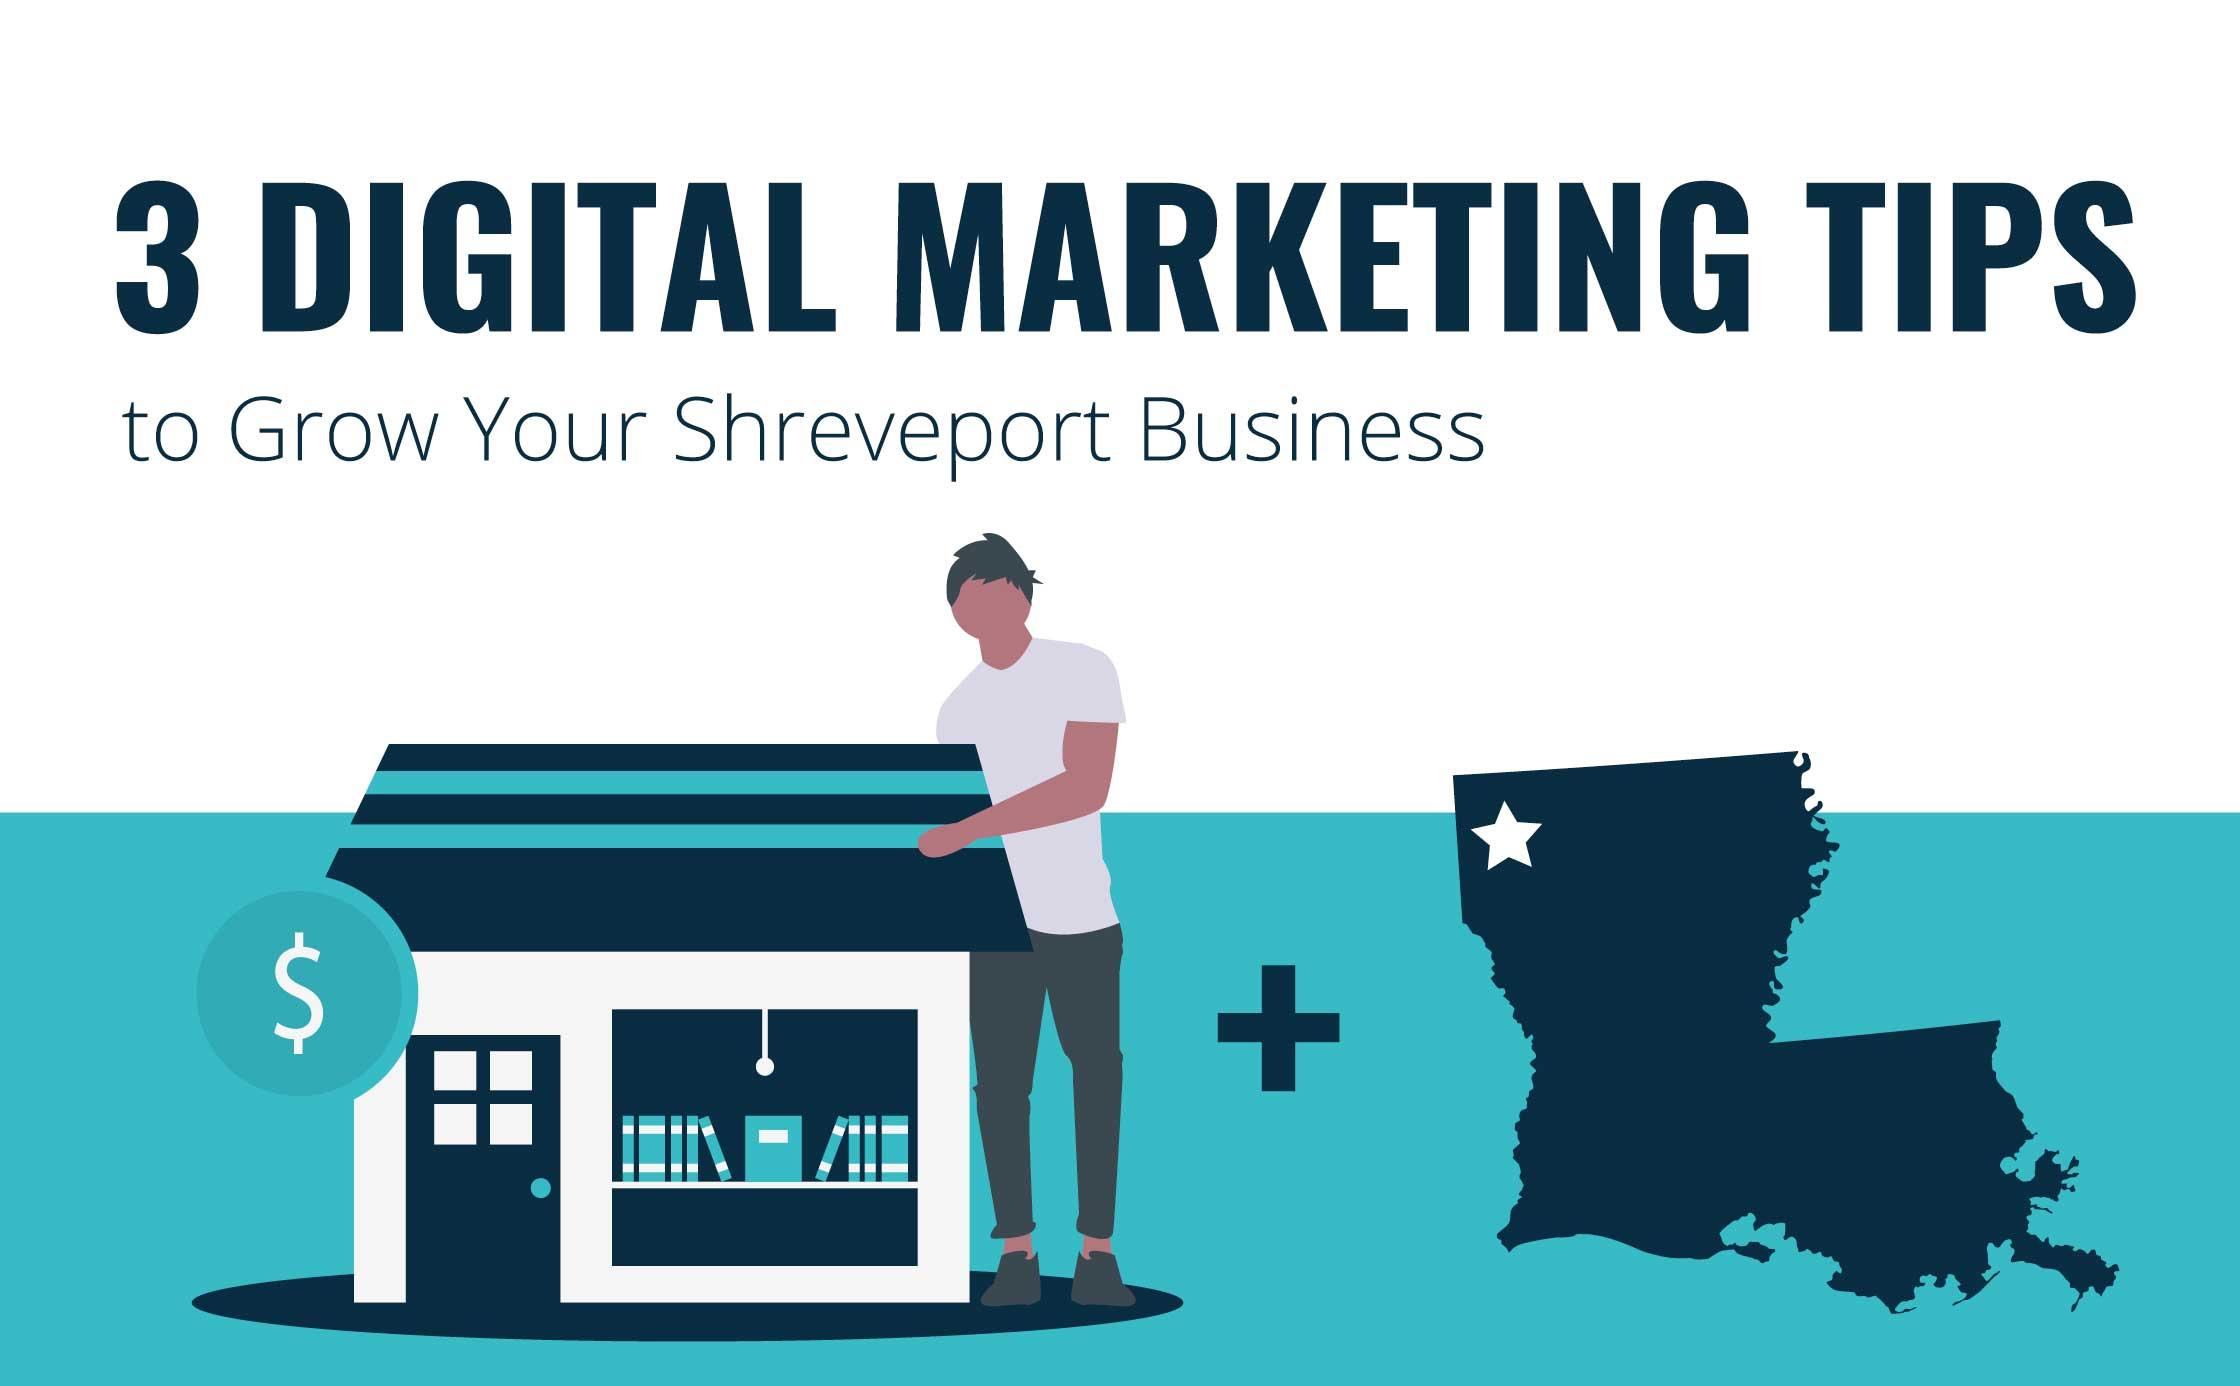 3 Digital Marketing Tips to Grow Your Shreveport Business